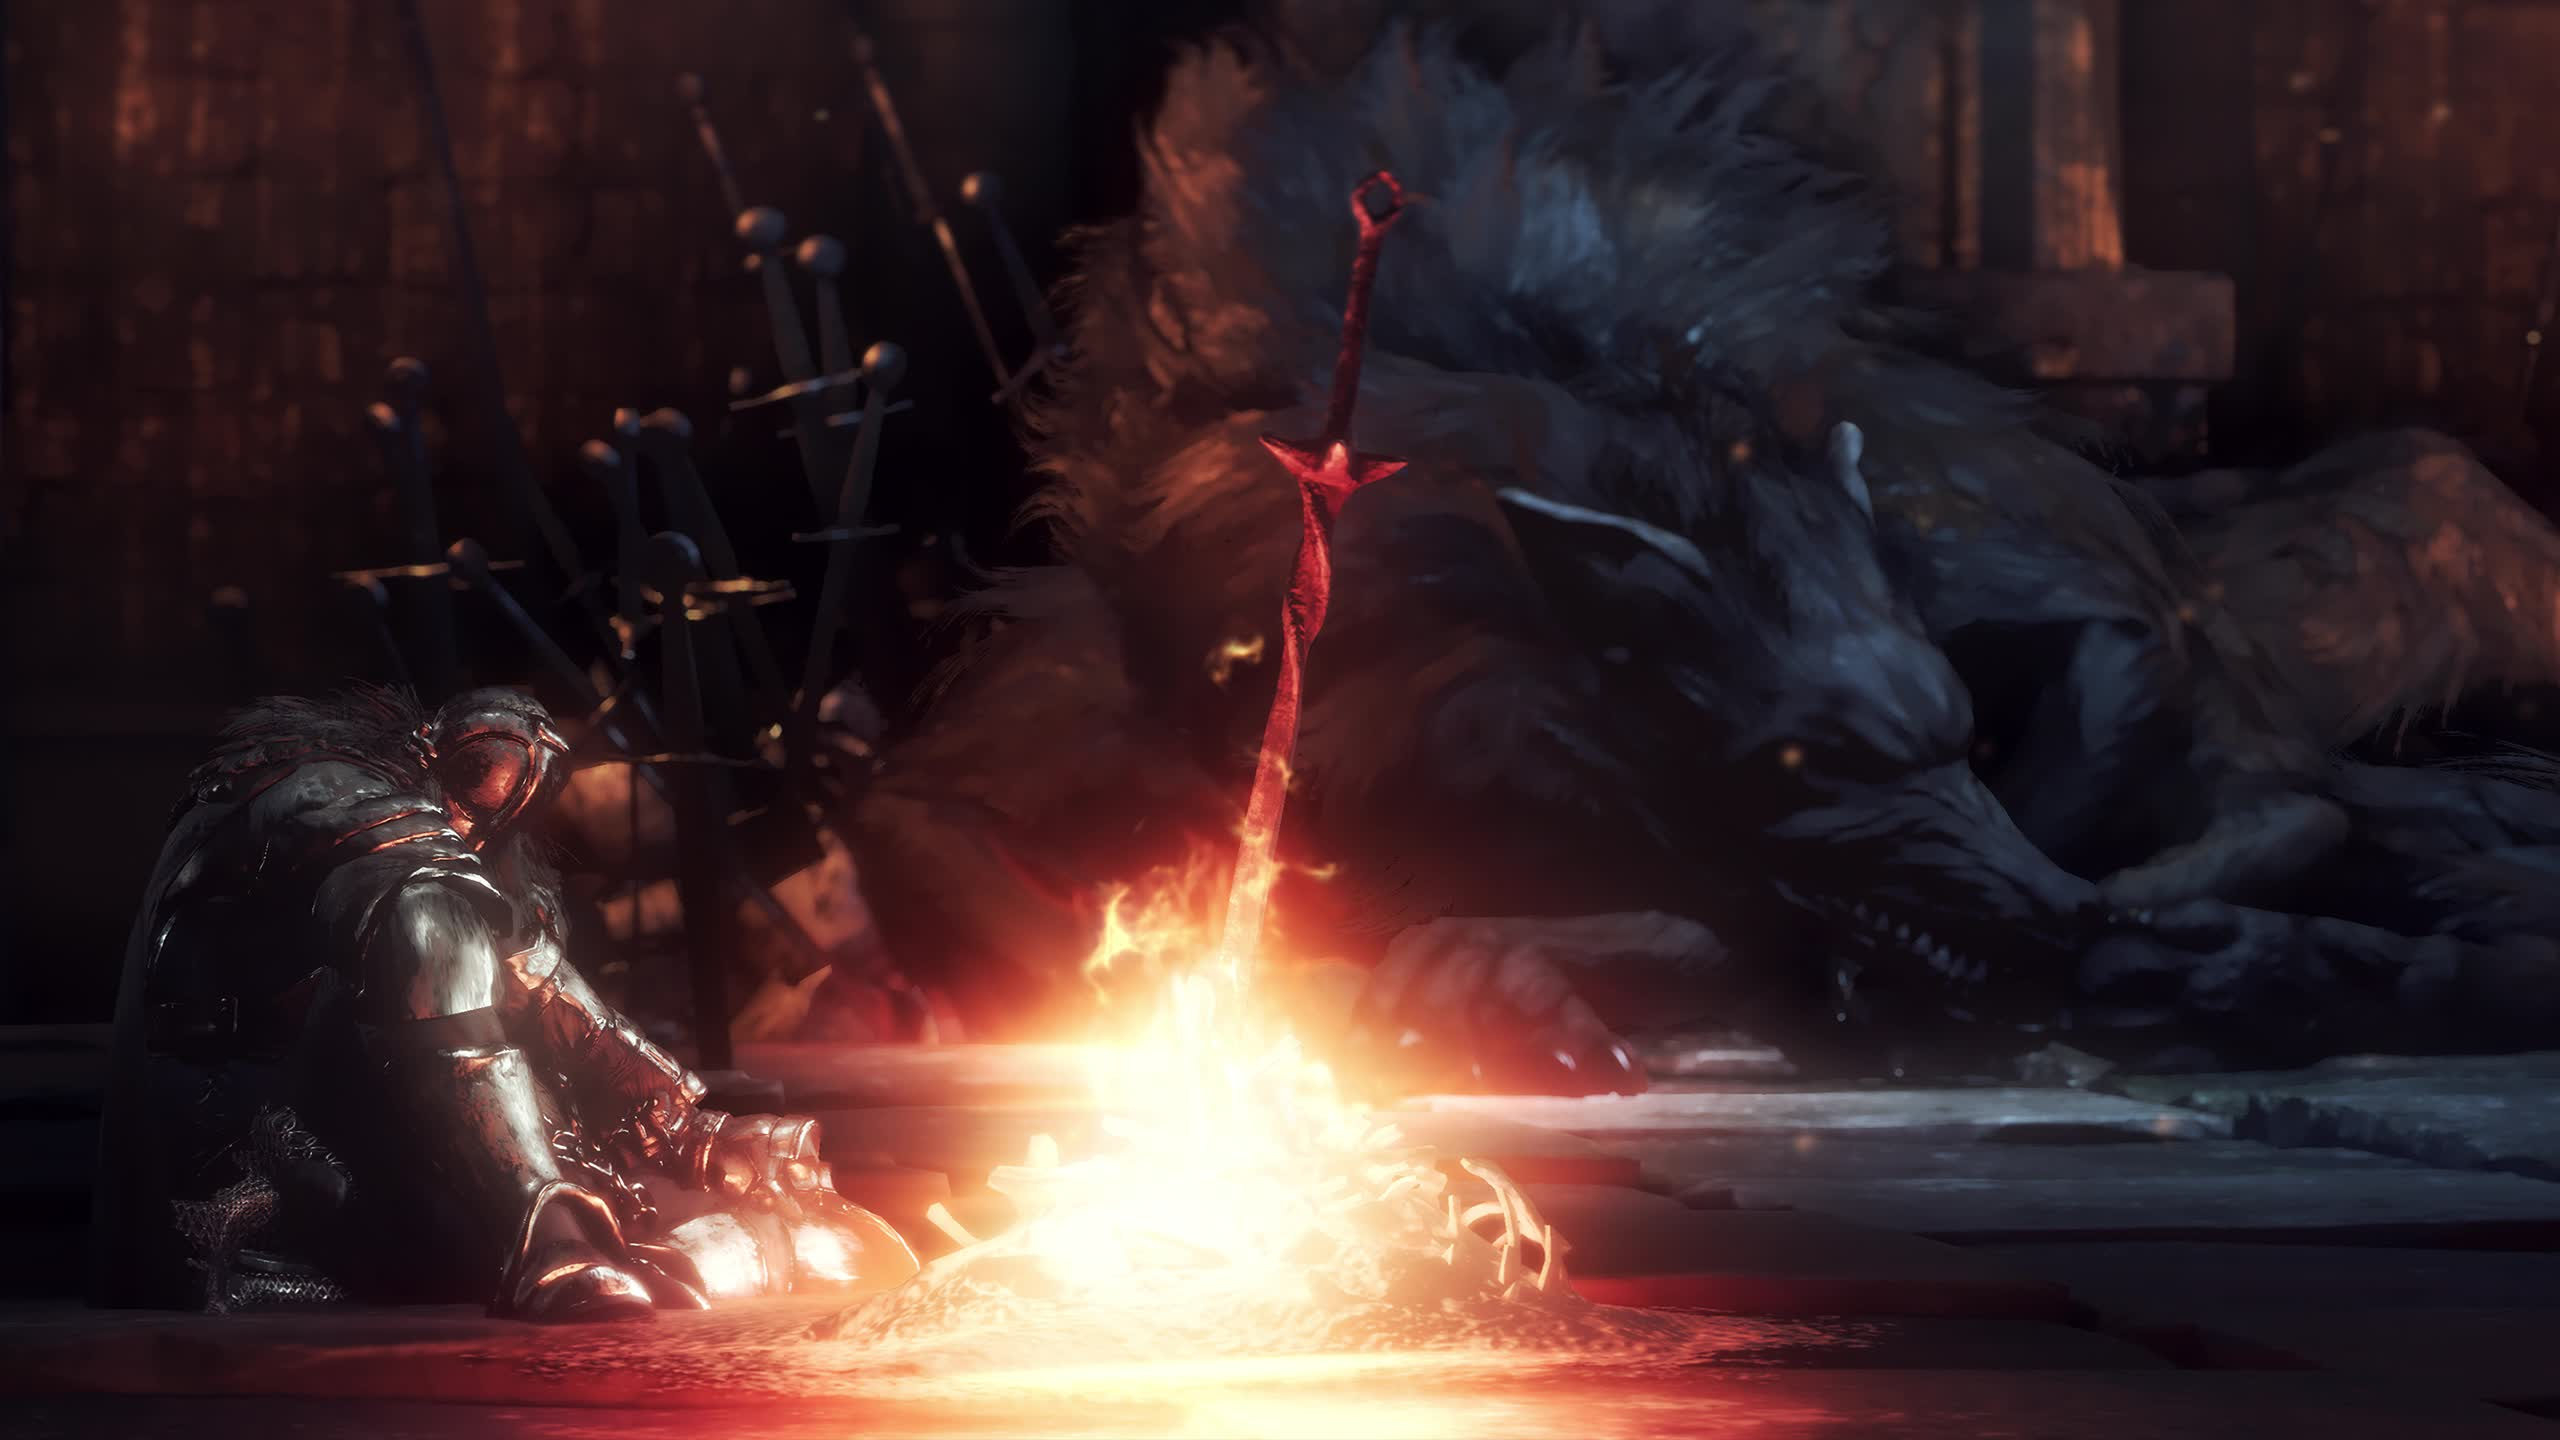 Dark Souls Bonfire Gif By Rzf Gfycat